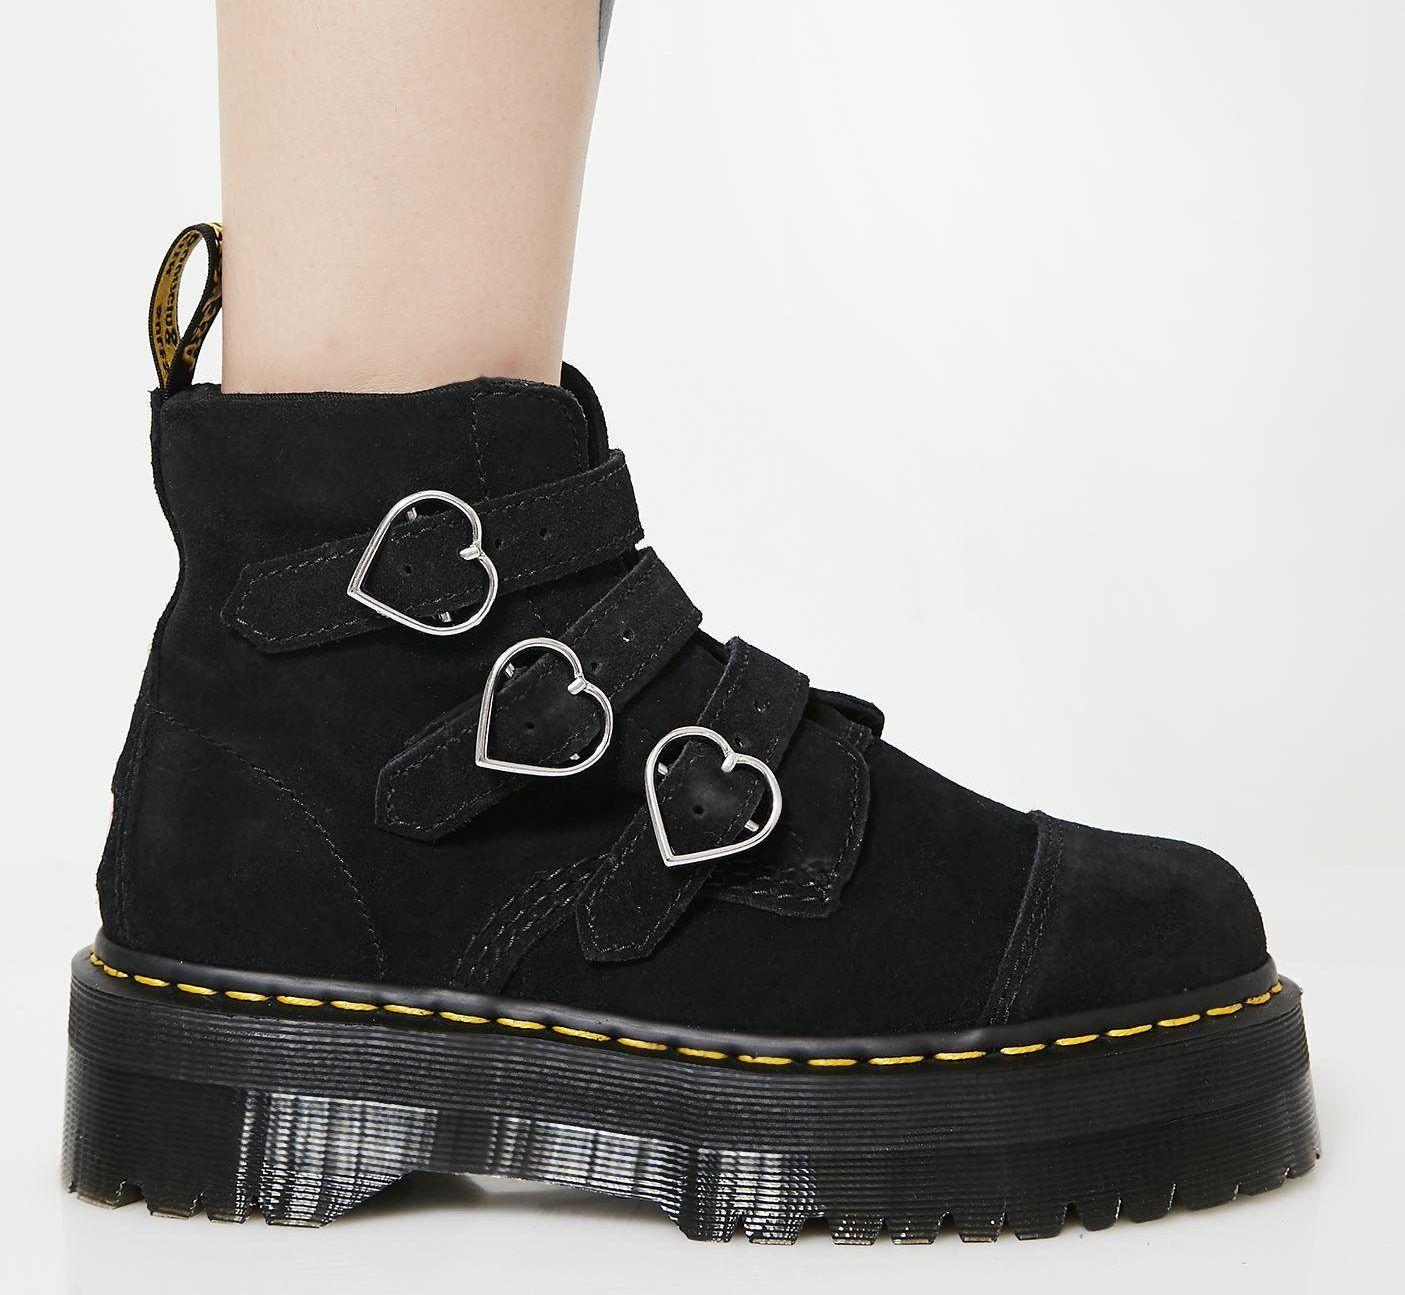 Dr. Martens Black Buckle Boots - Women